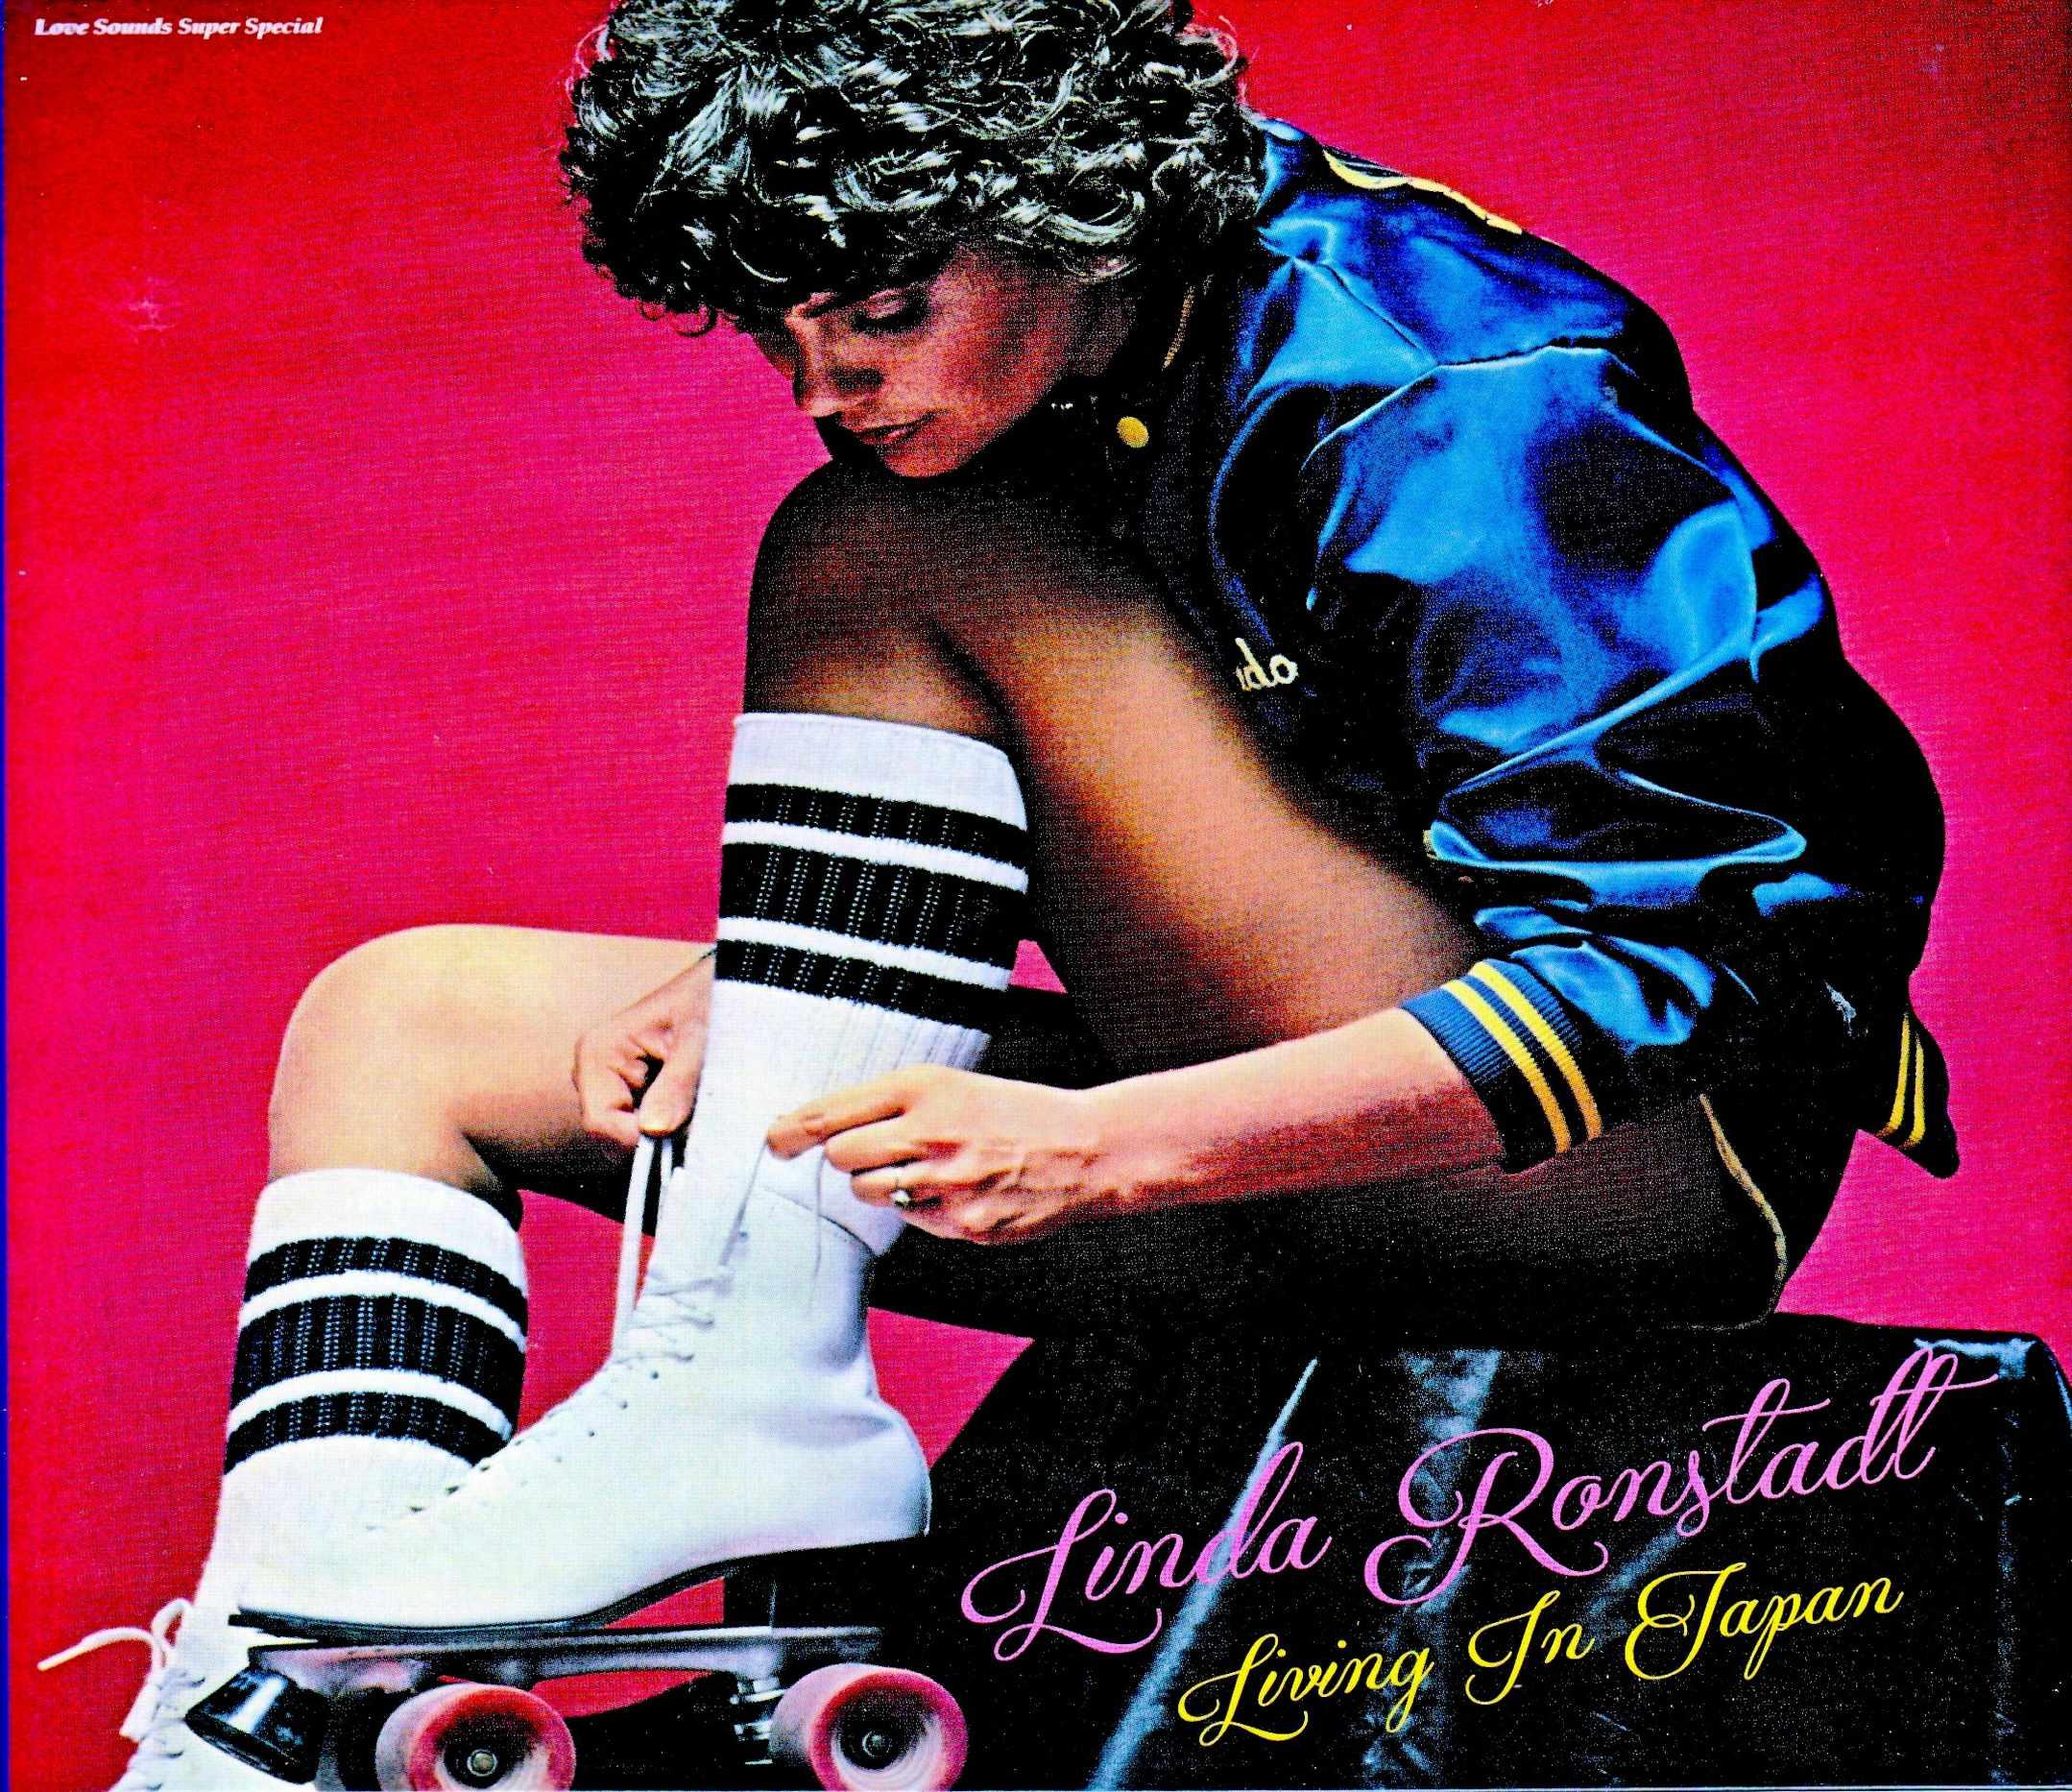 Linda Ronstadt リンダ・ロンシュタット/日本武道館公演 1979年 ピーター・アッシャー・マスター